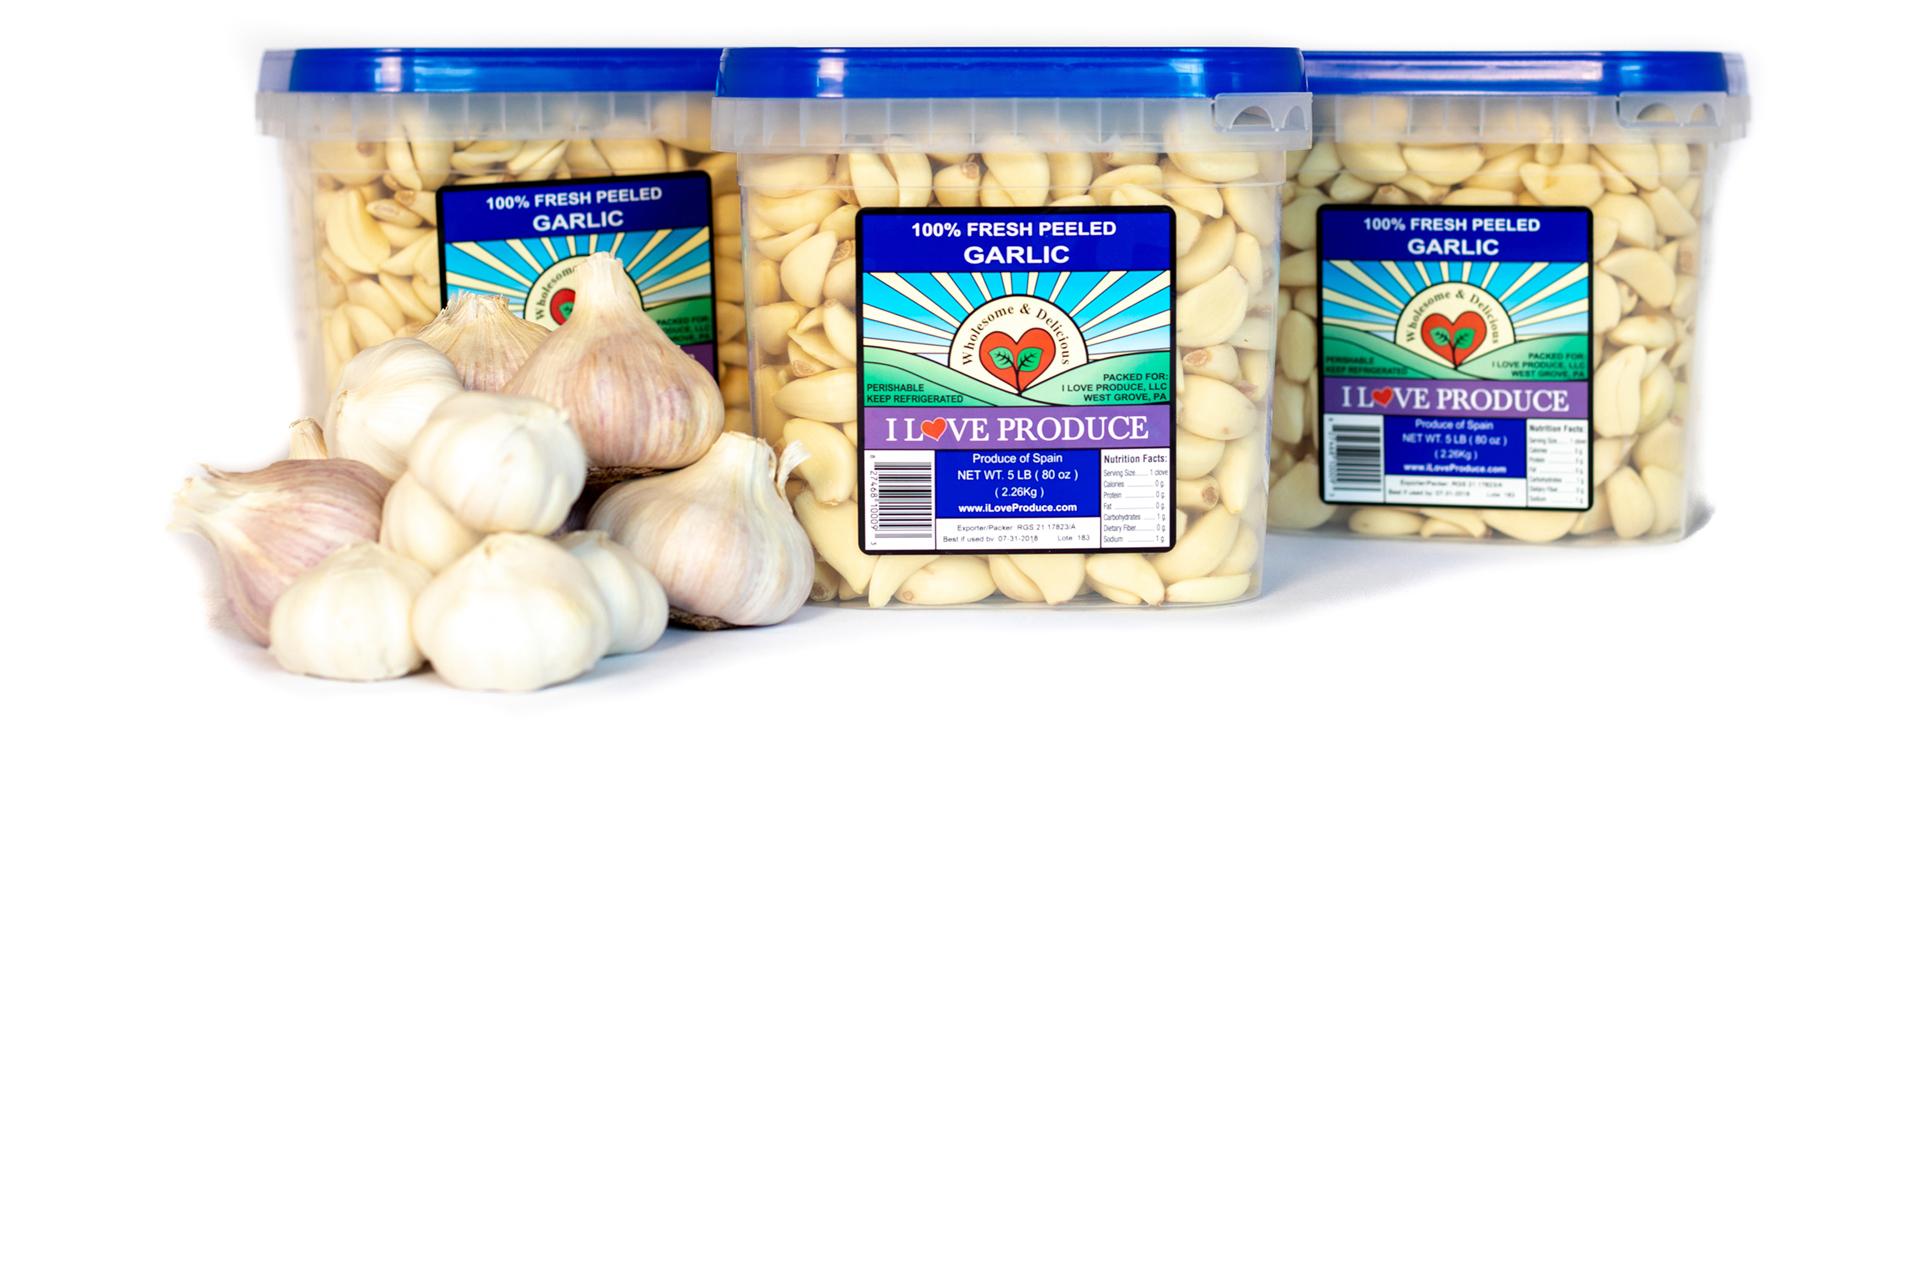 Spain Garlic